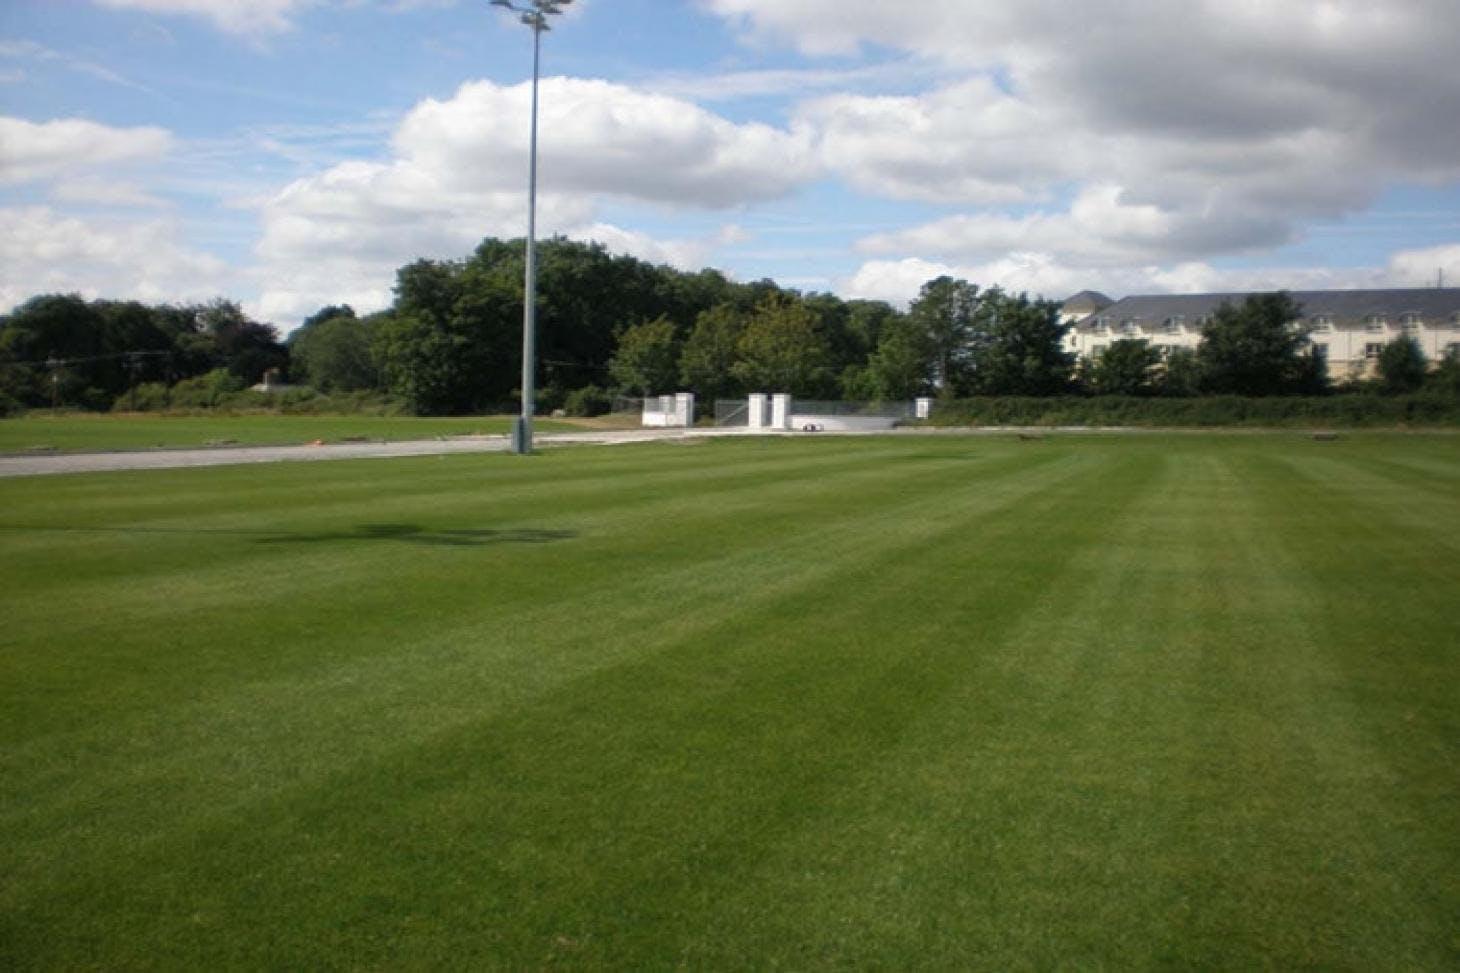 Castleknock GAA Club Full size | Grass gaa pitch